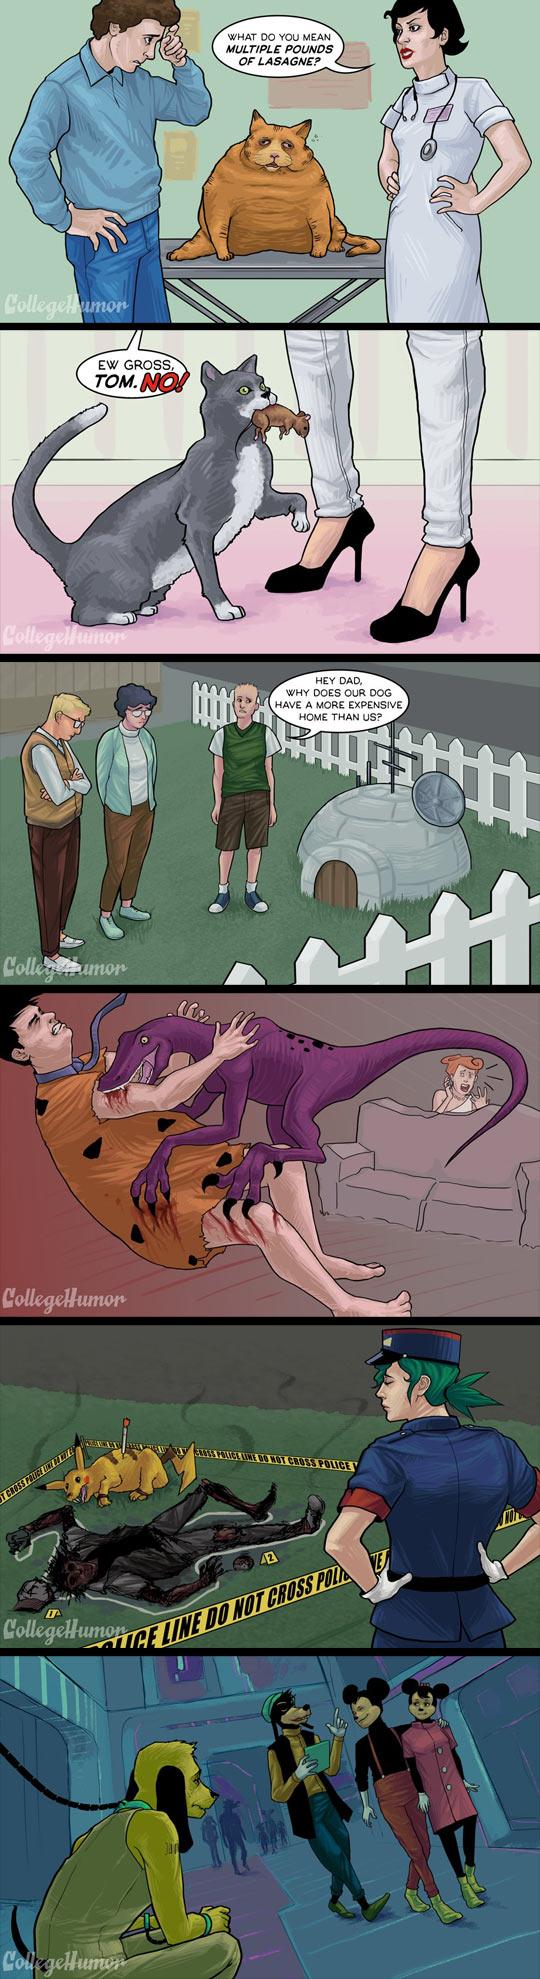 funny-pet-cartoon-Garfield-real